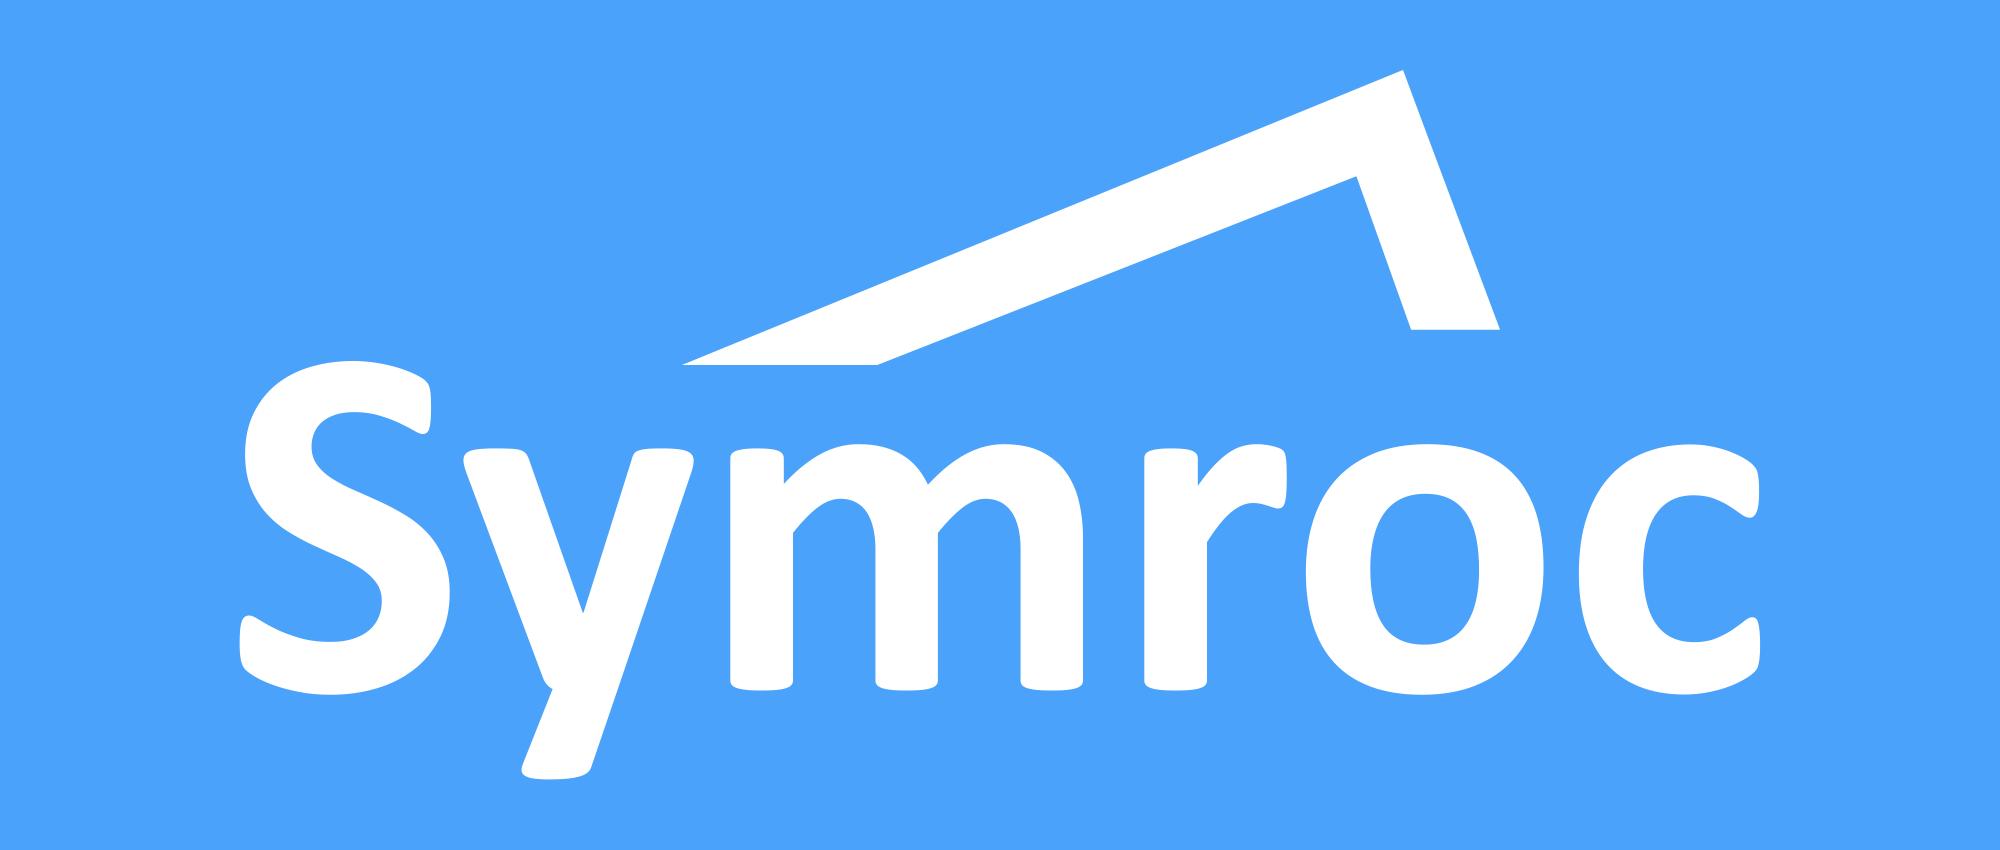 Symroc